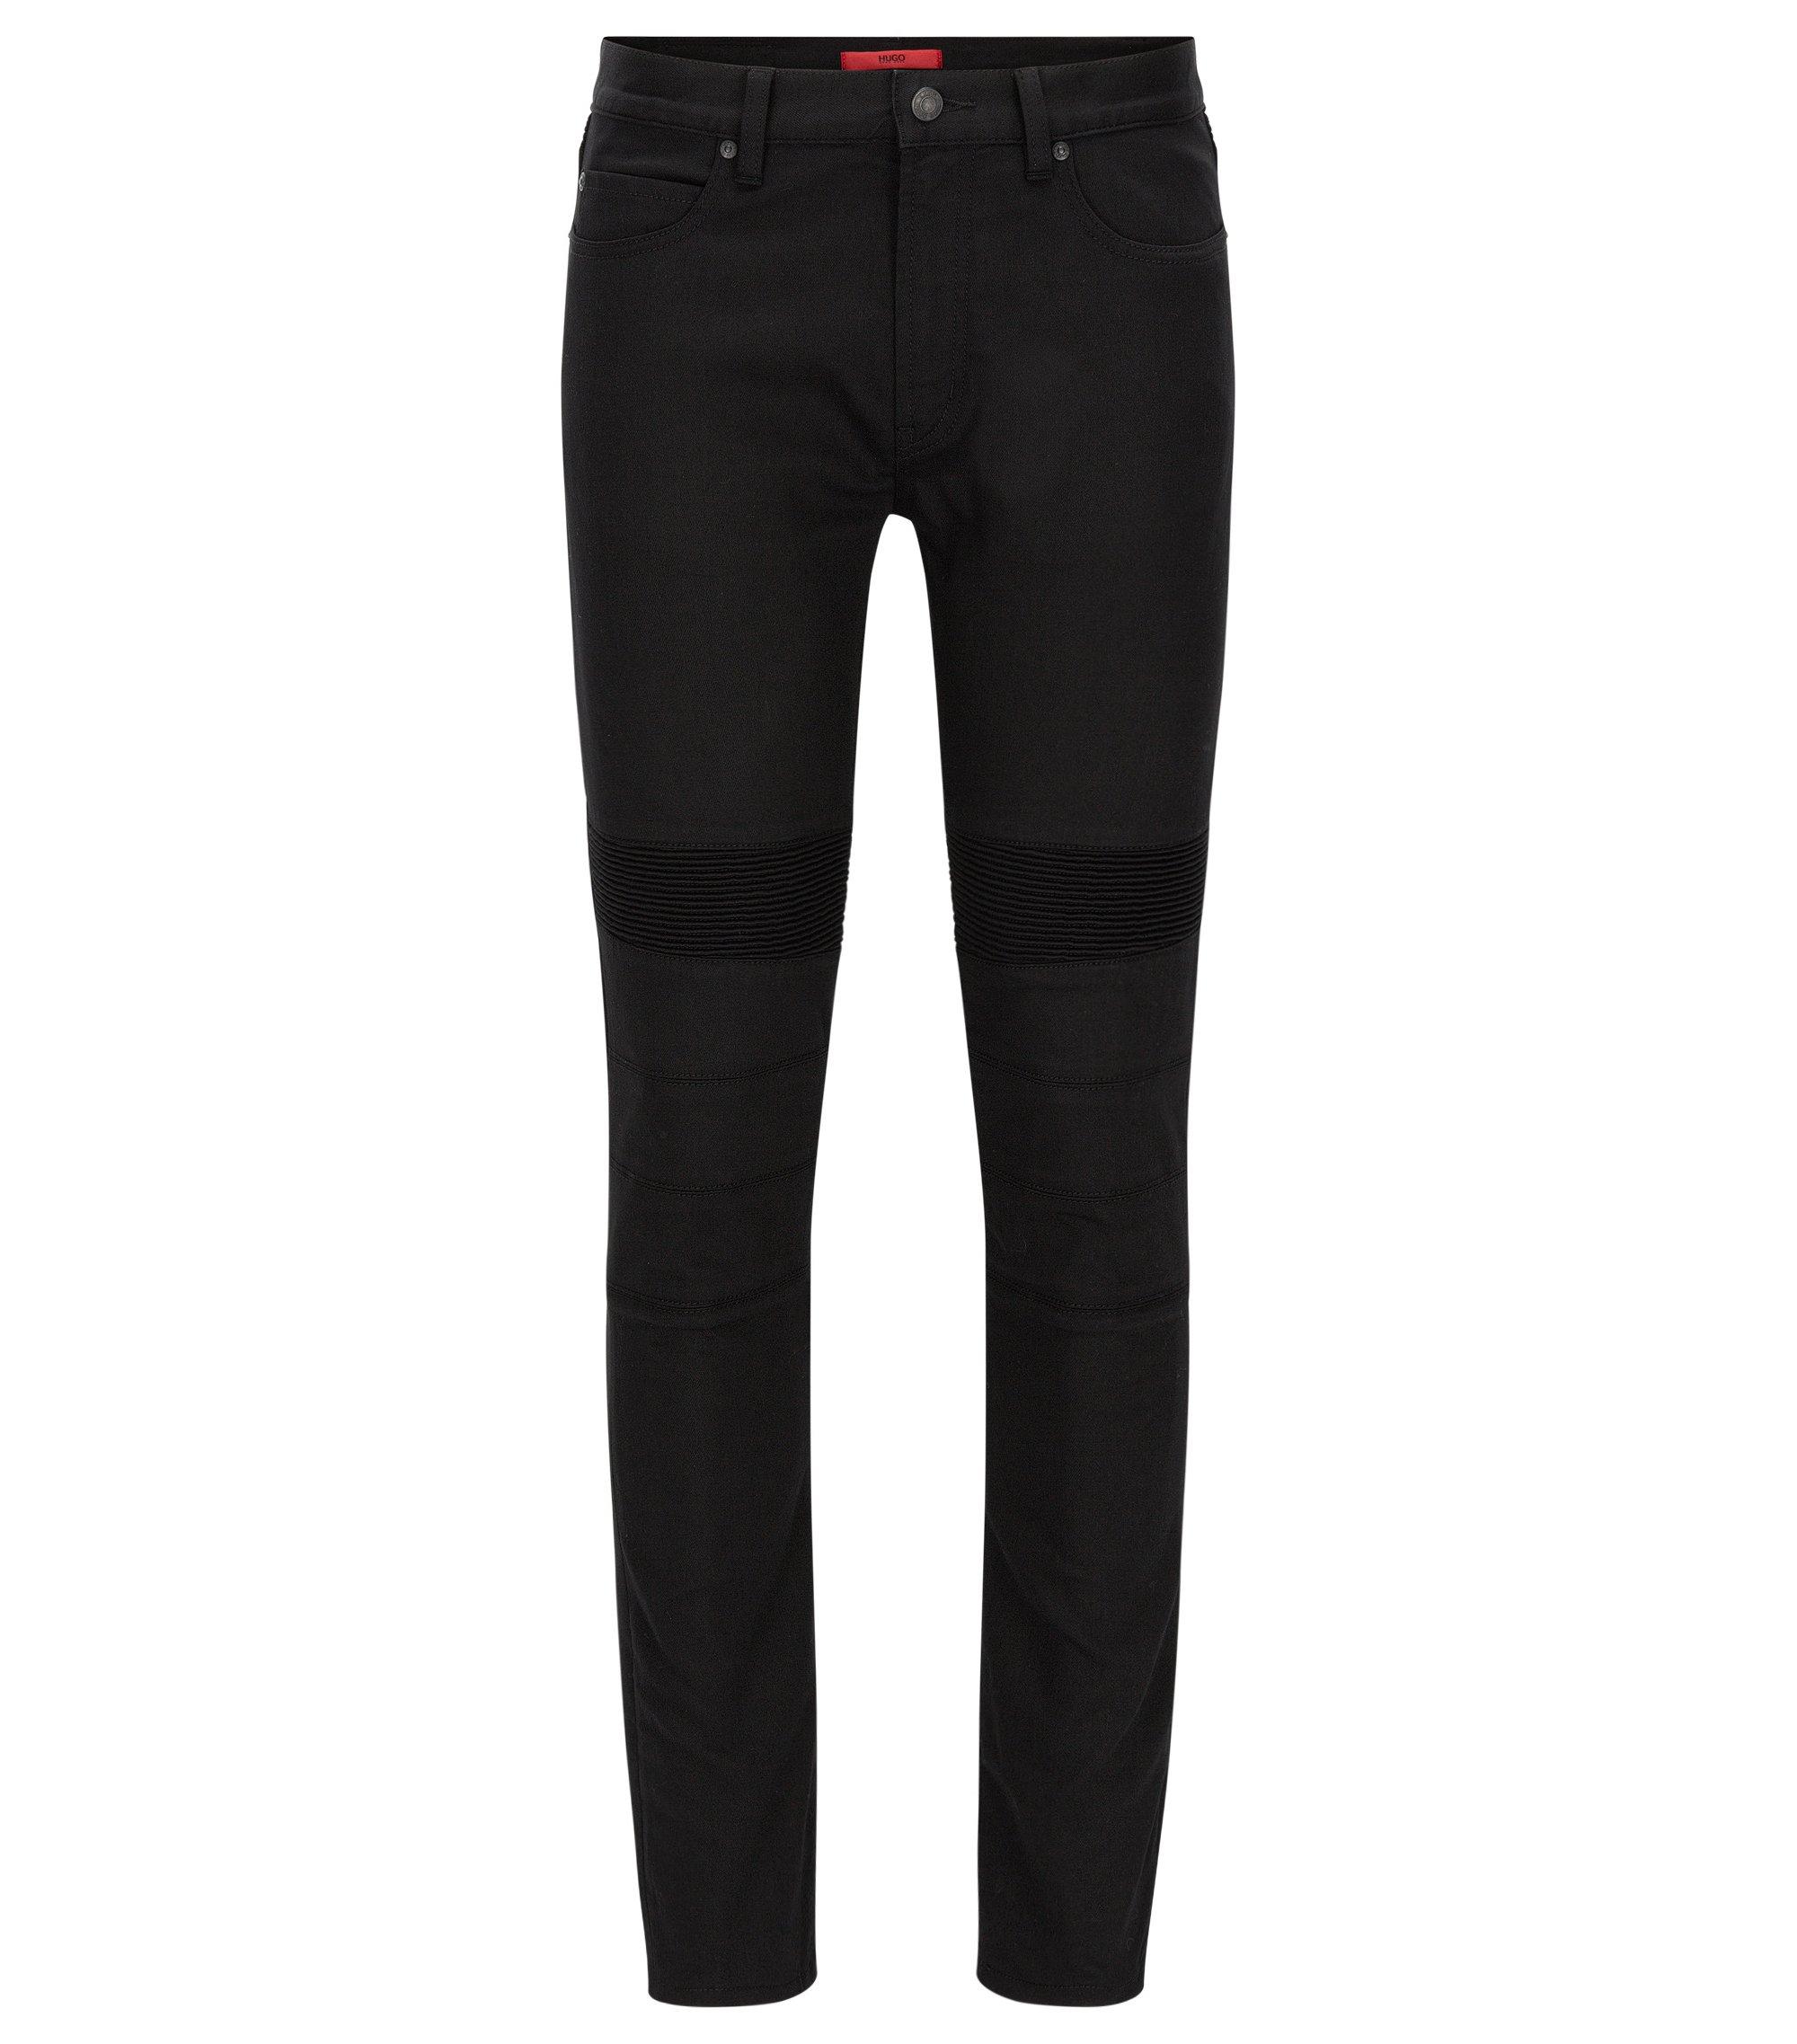 Jeans extra slim fit en denim stretch style motard, Noir